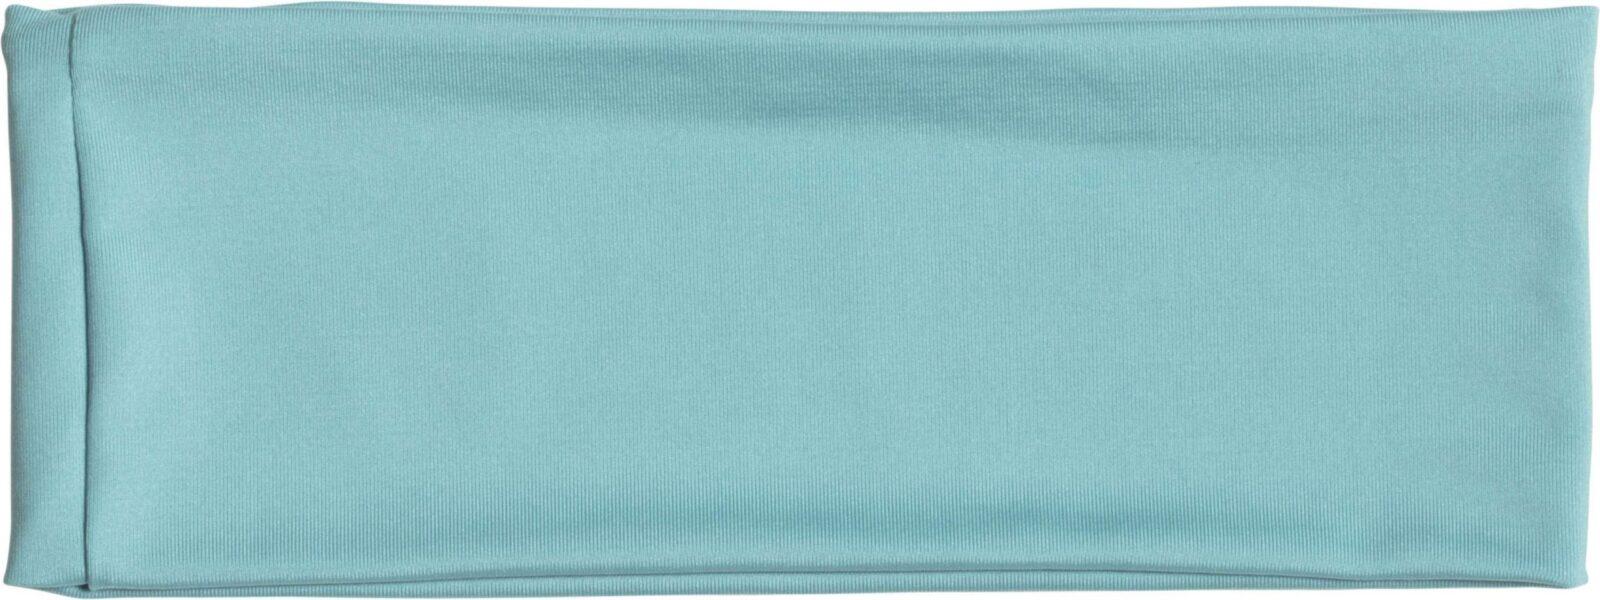 Banda cap sport KP428 albastru laguna Caciuli sepci personalizate fulare manusi acryl bumbac poliester fleece polar reglabil catarama termotransfer serigrafie broderie